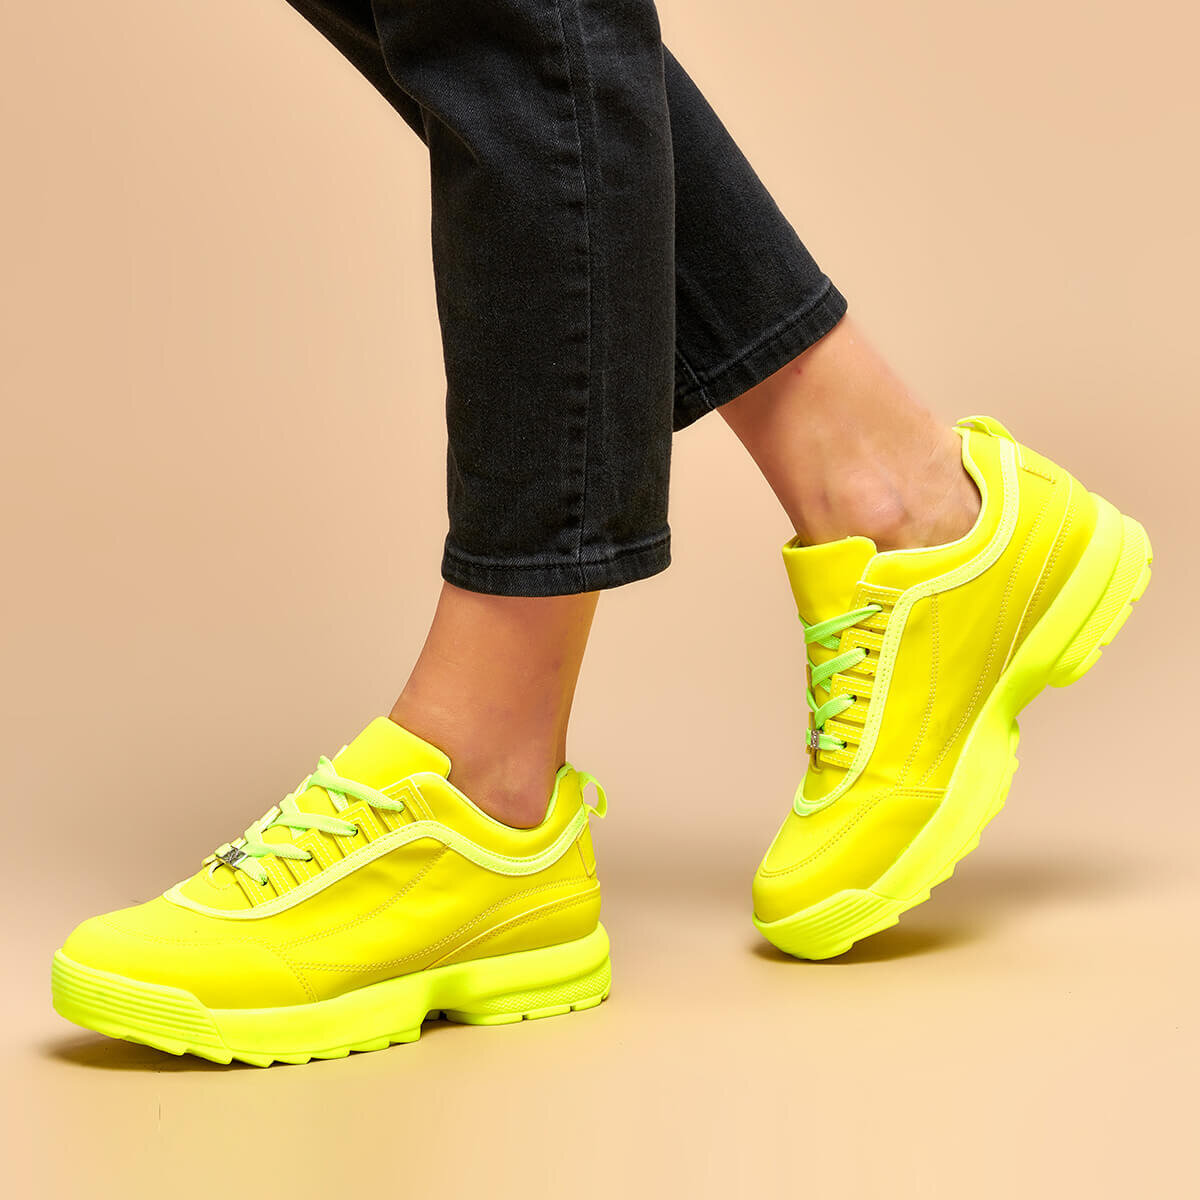 FLO 19K-950 Neon Yellow Women 'S Sneaker BUTIGO